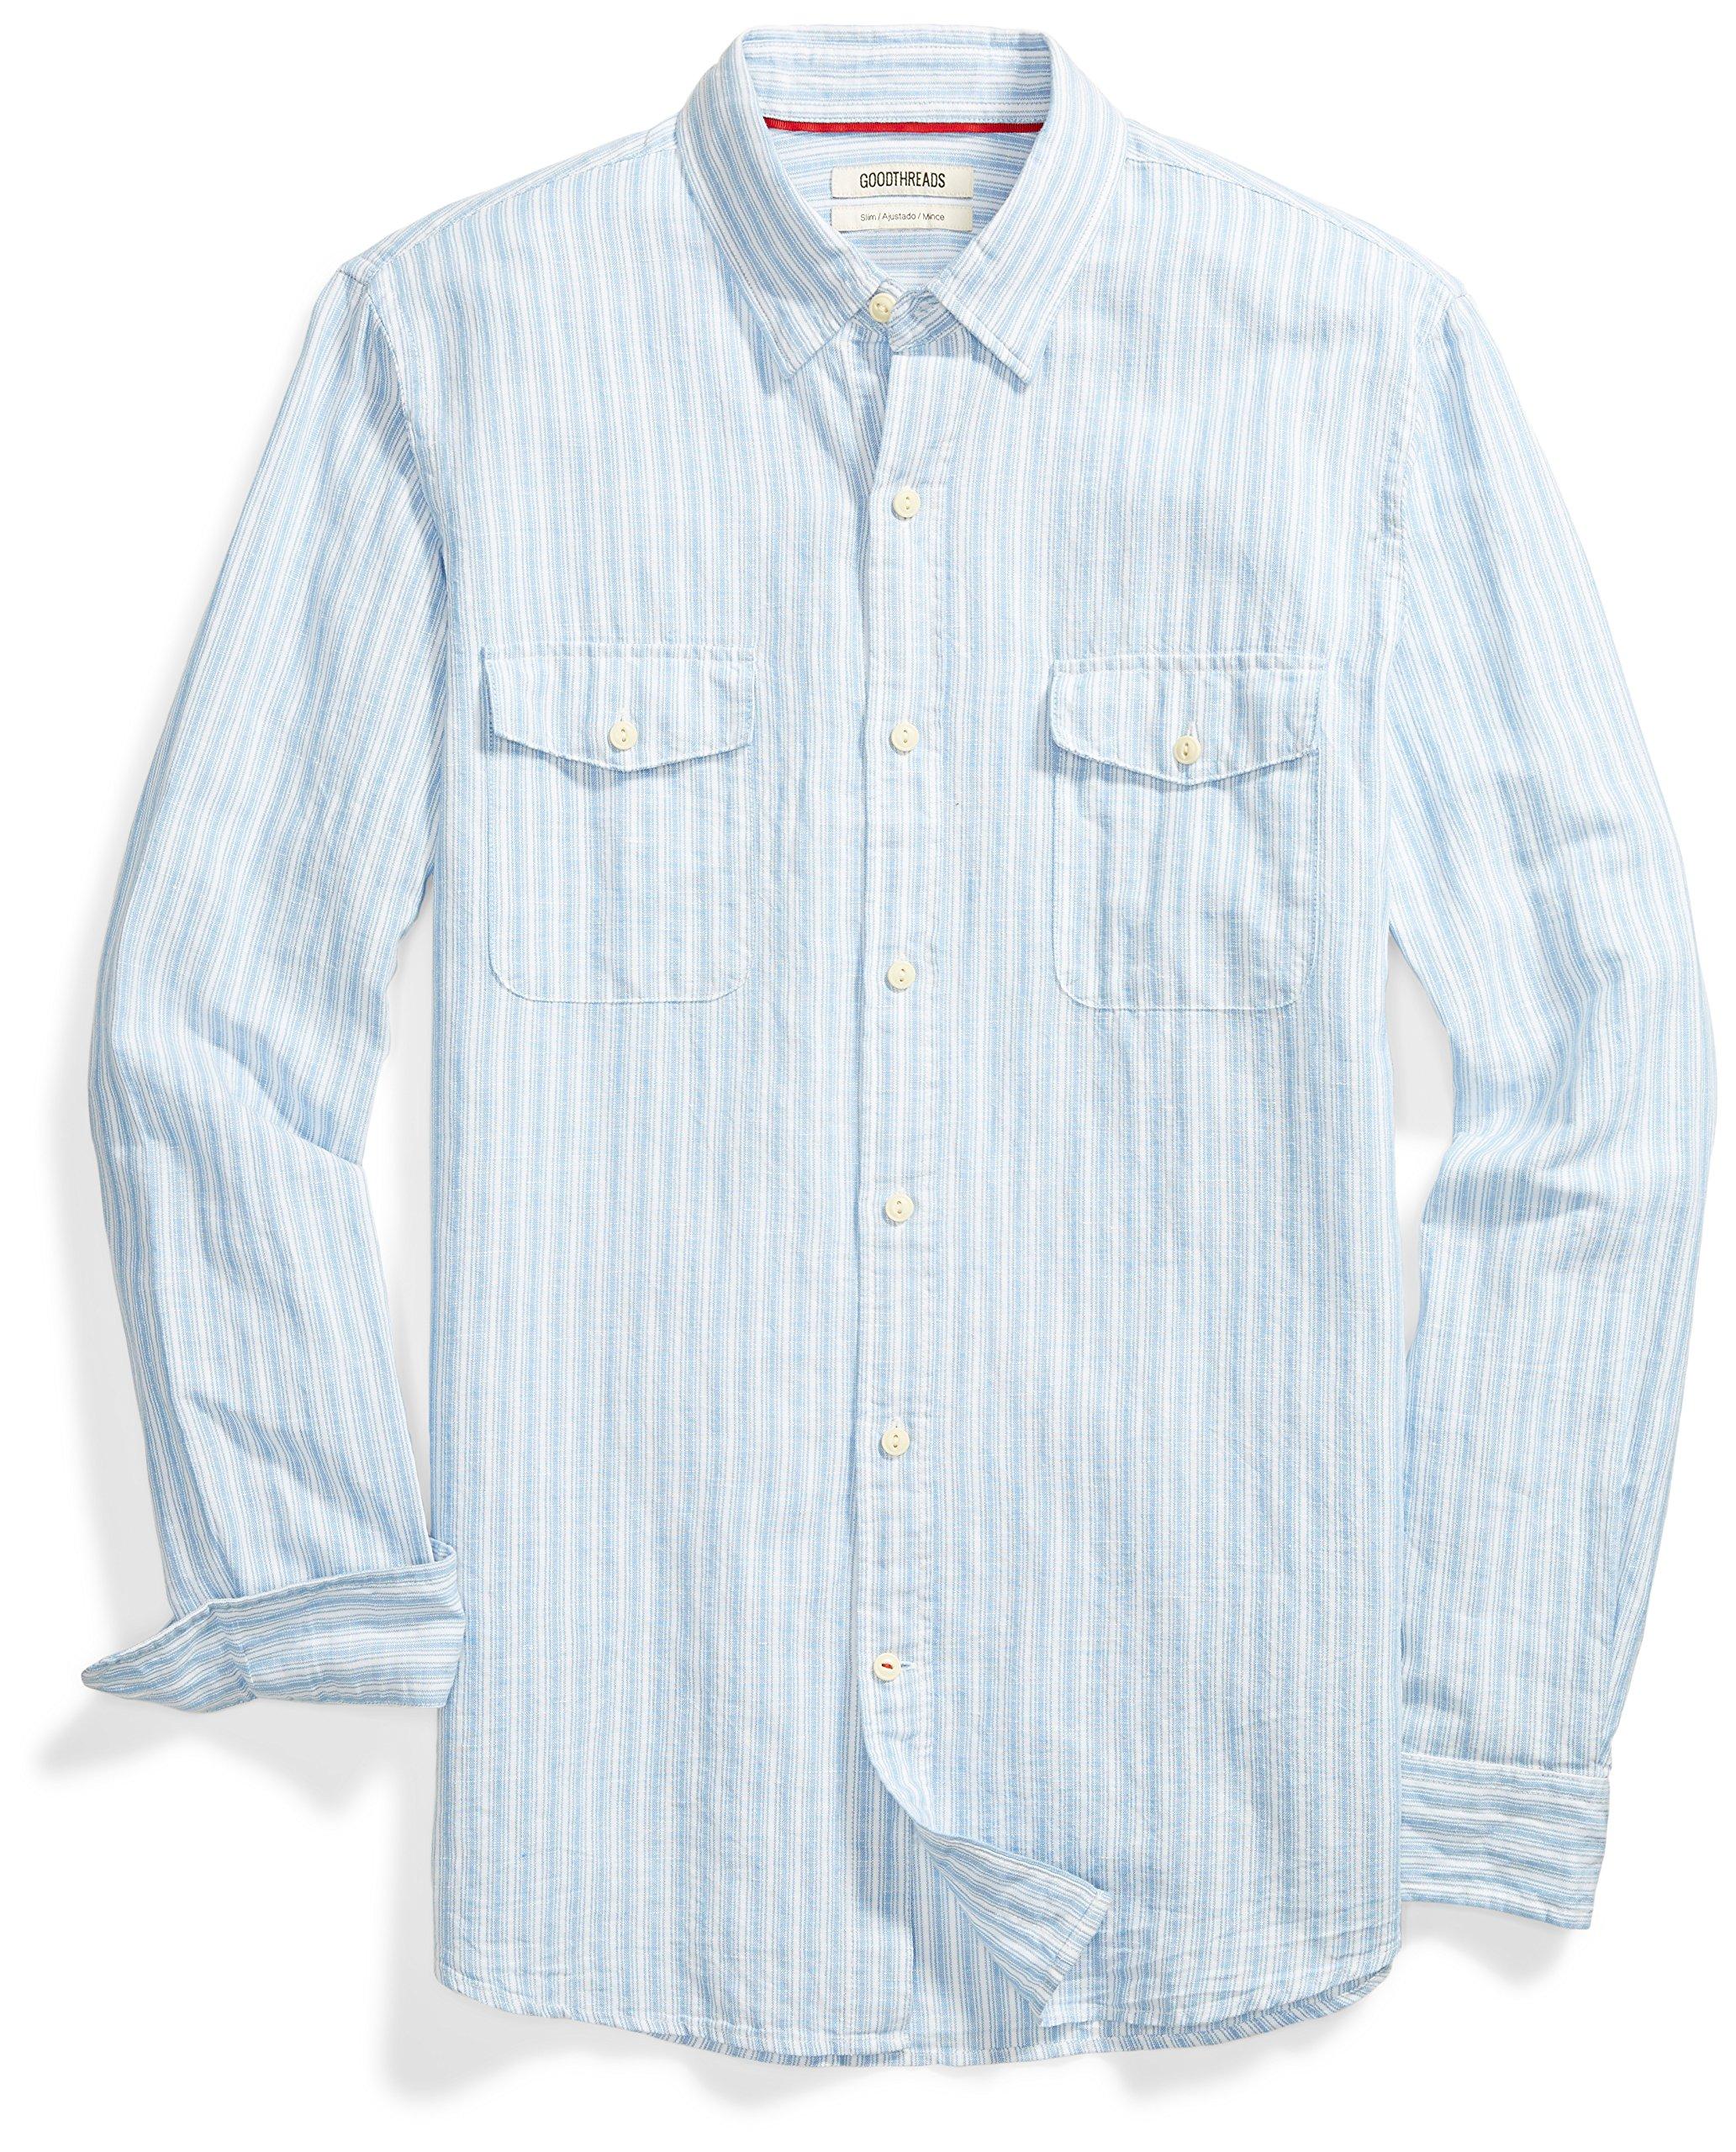 Goodthreads Men's Slim-Fit Long-Sleeve Linen and Cotton Blend Shirt, Light Blue/Multi Stripe, XX-Large